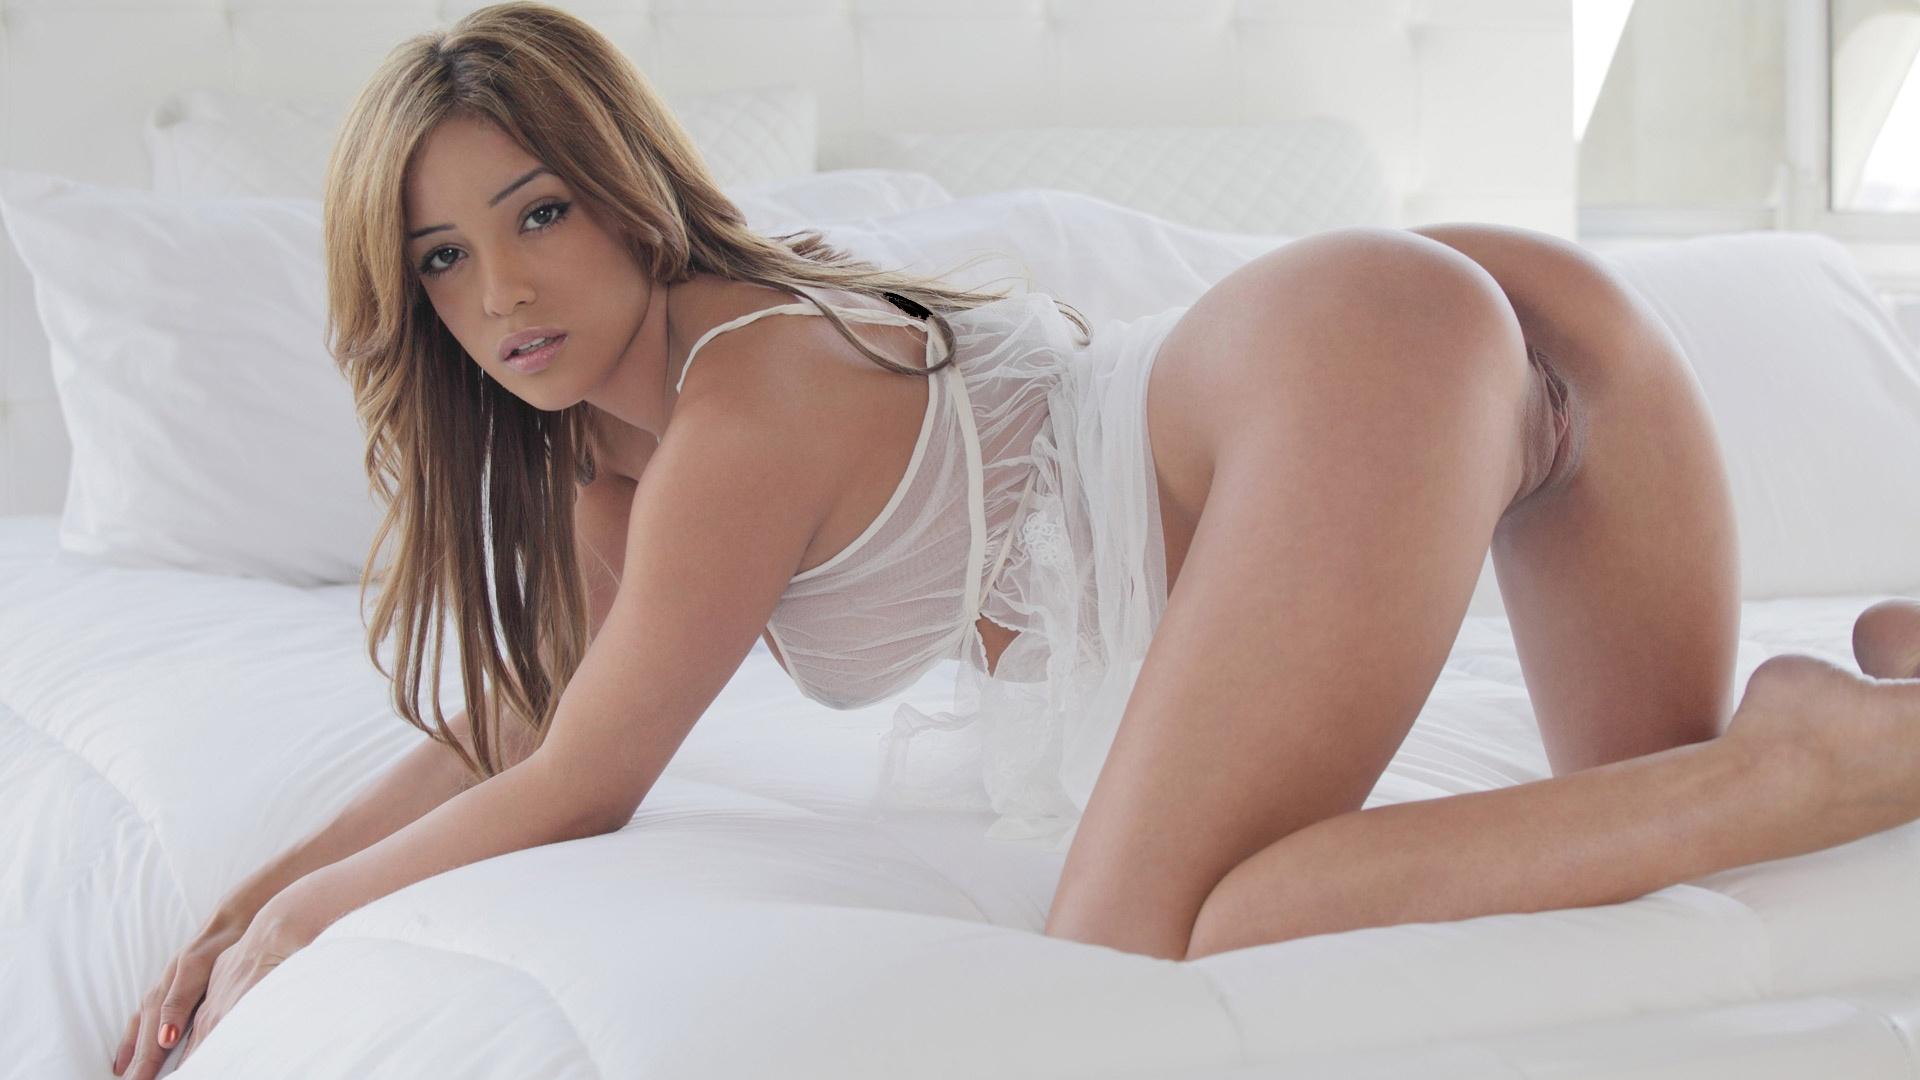 Artistic fantsy women porn hd wallpepar adult images